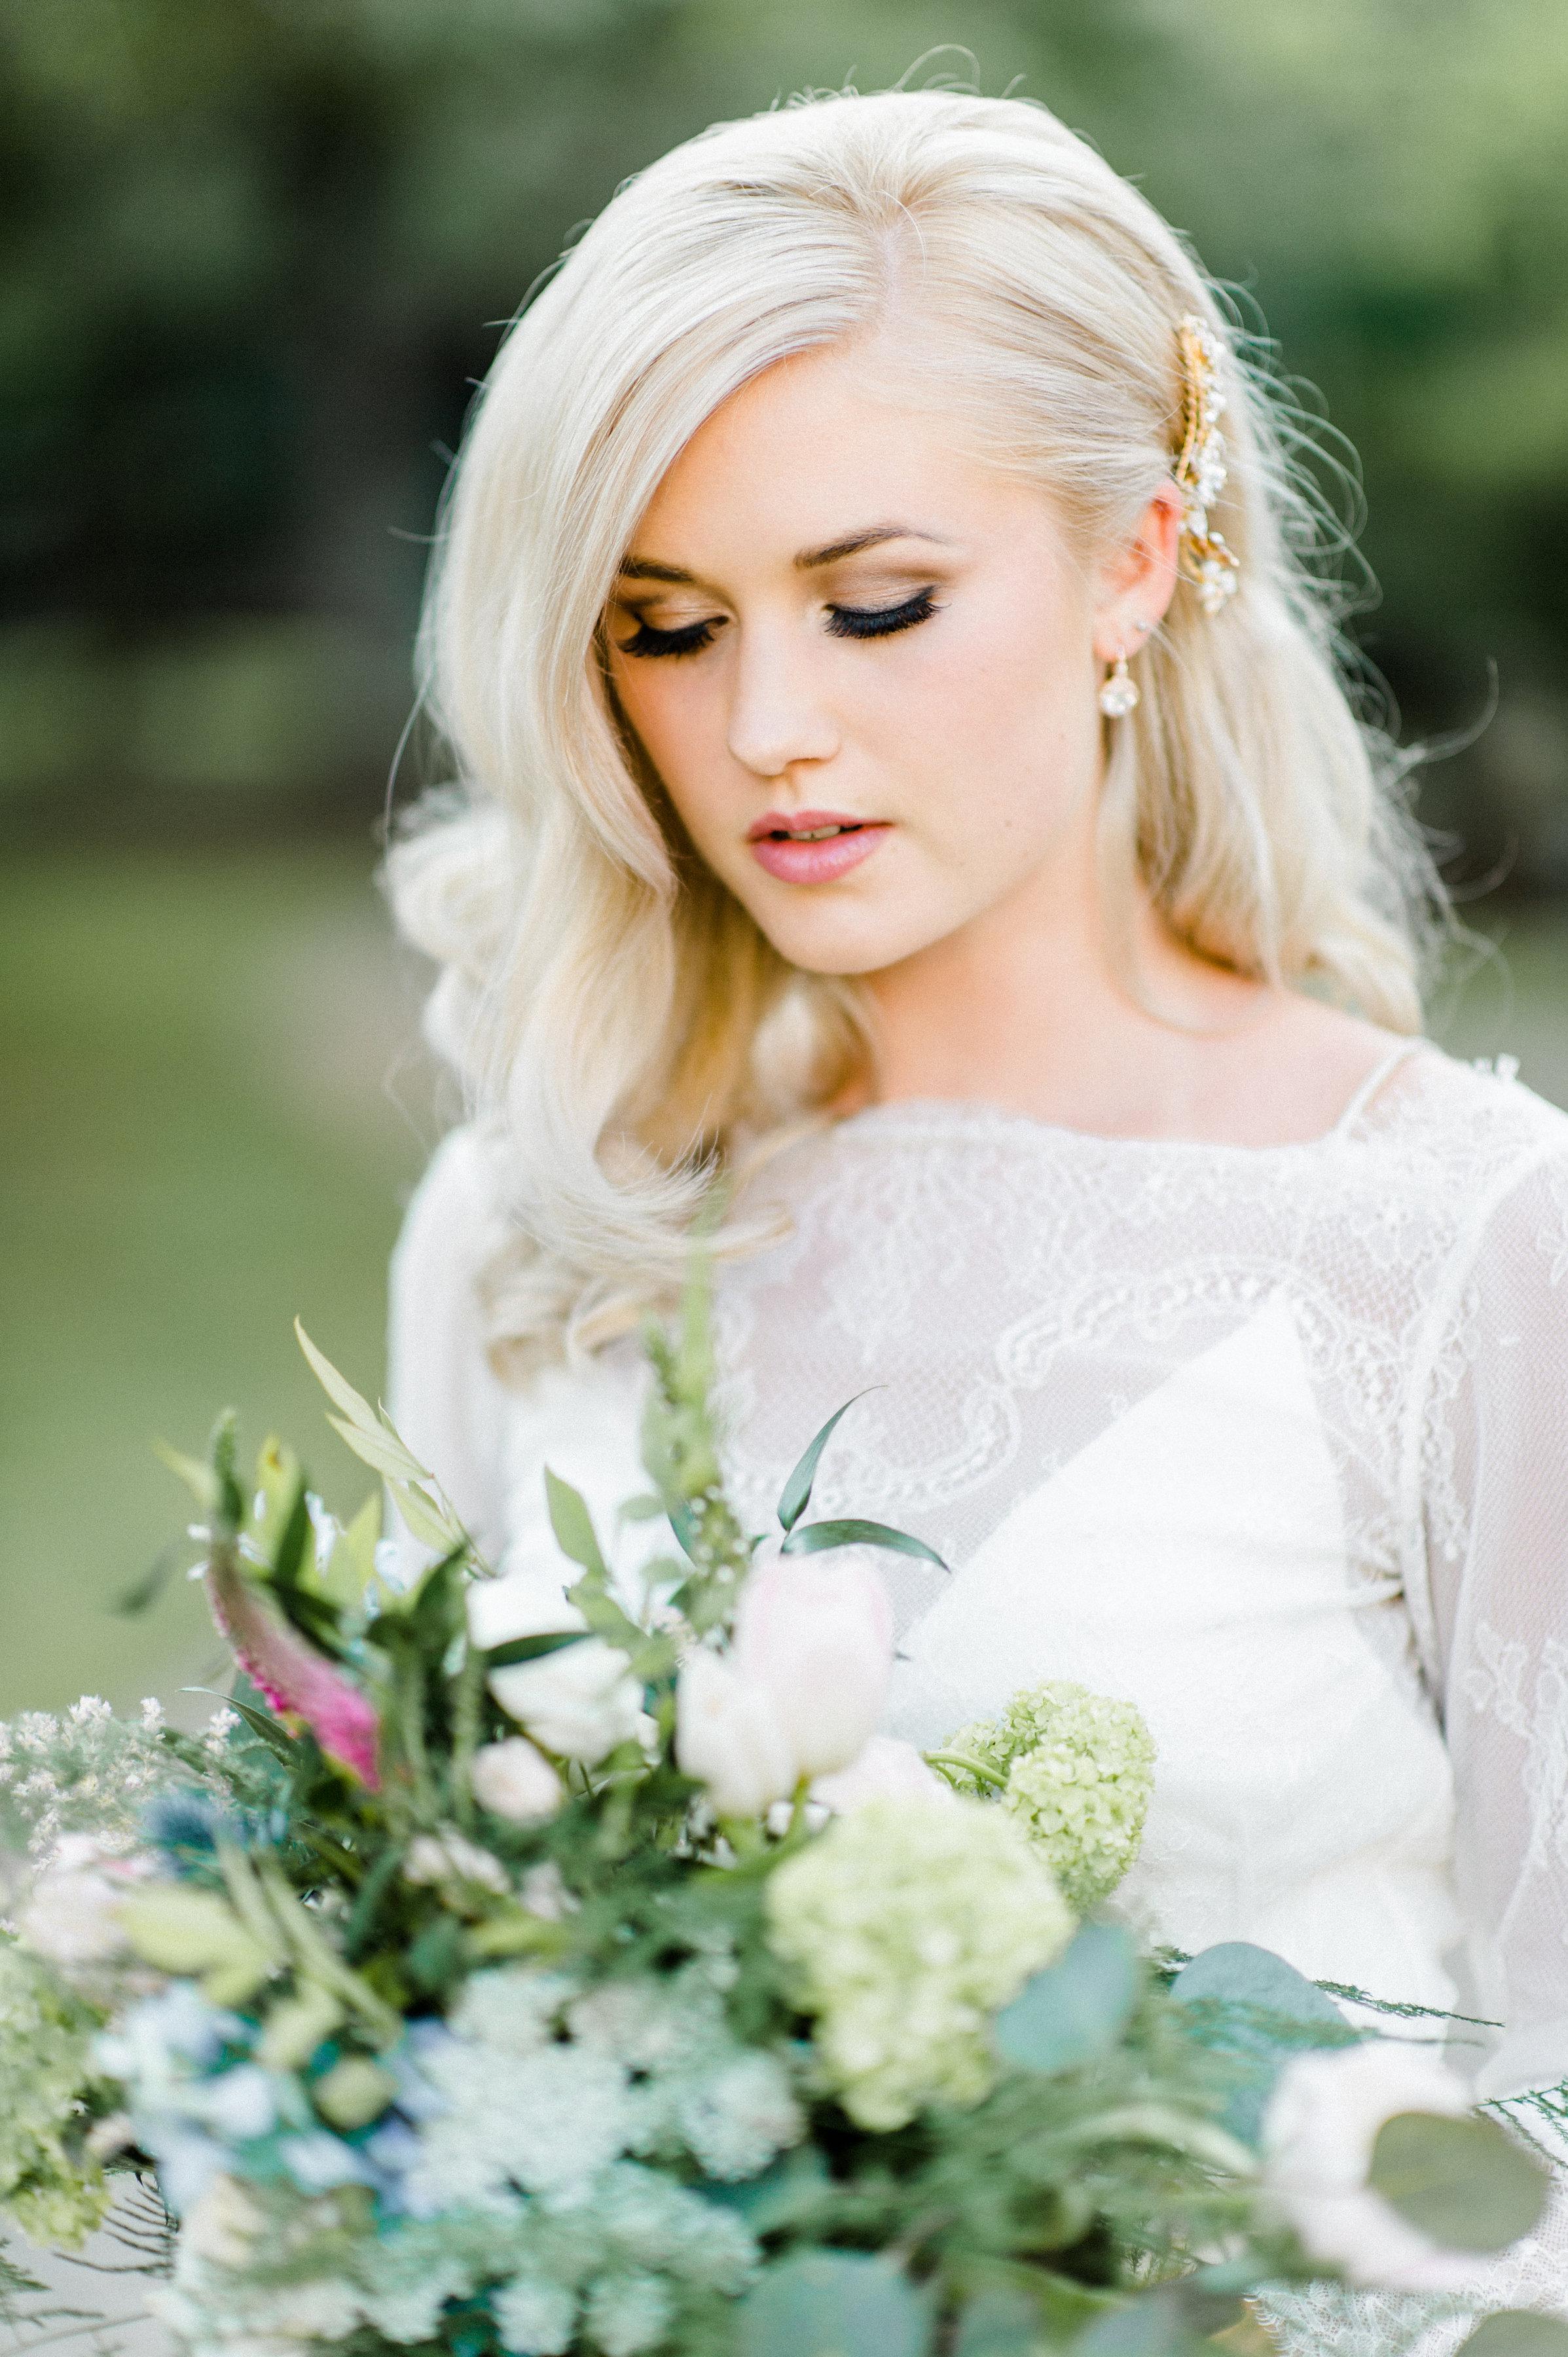 CarolineLimaPhotography_TheSutherland_Editorial_2016_241.jpg